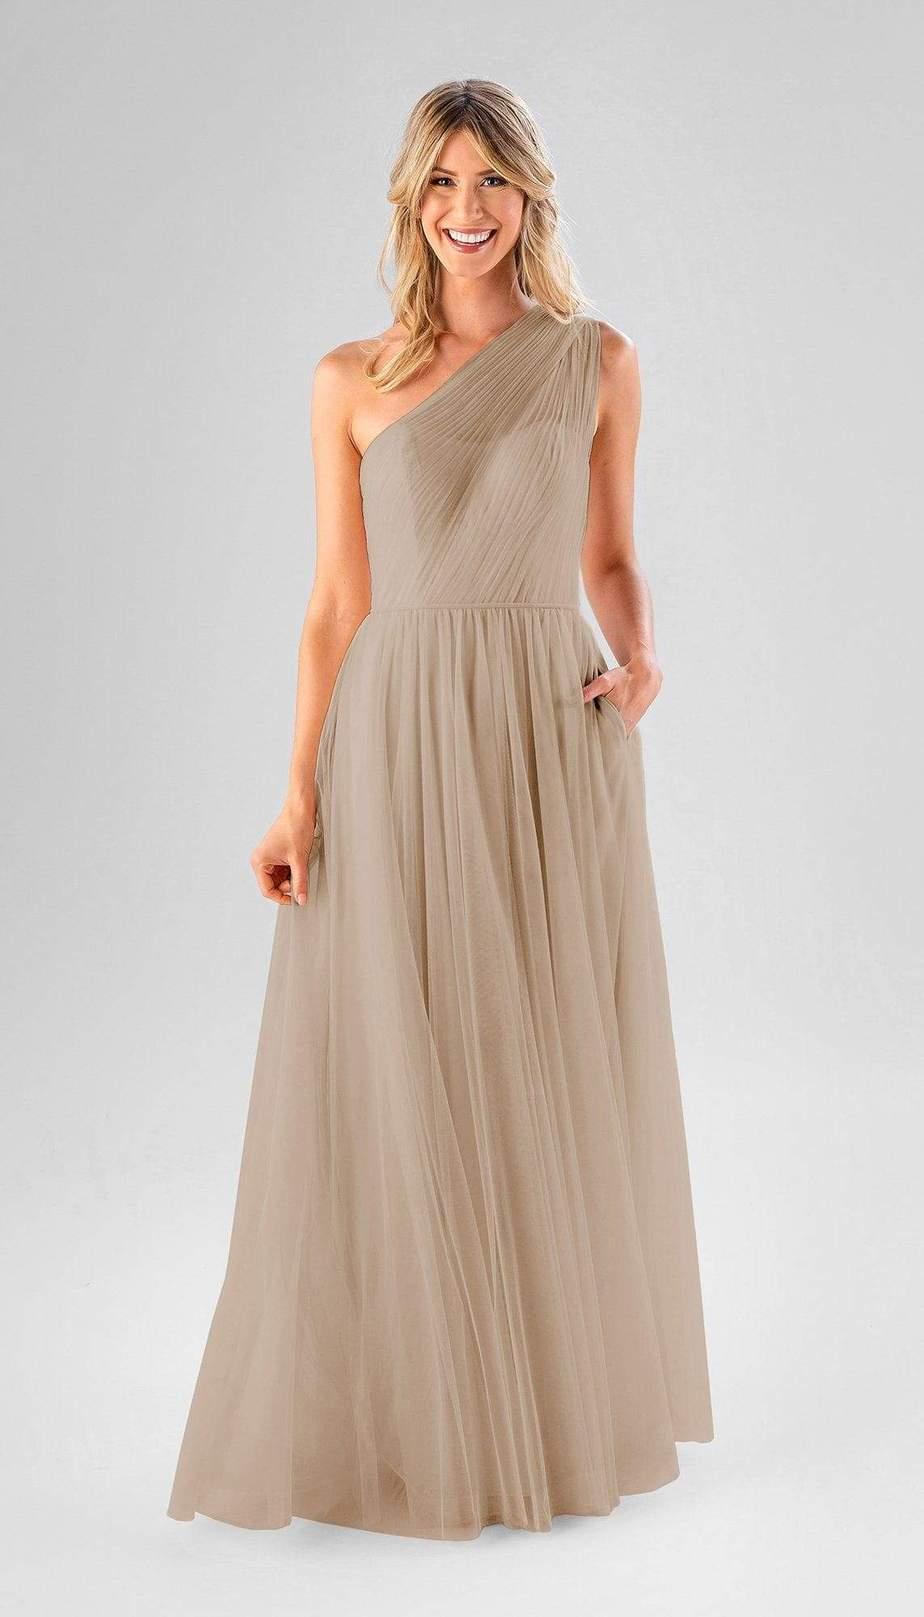 long one shoulder beige bridesmaid dress